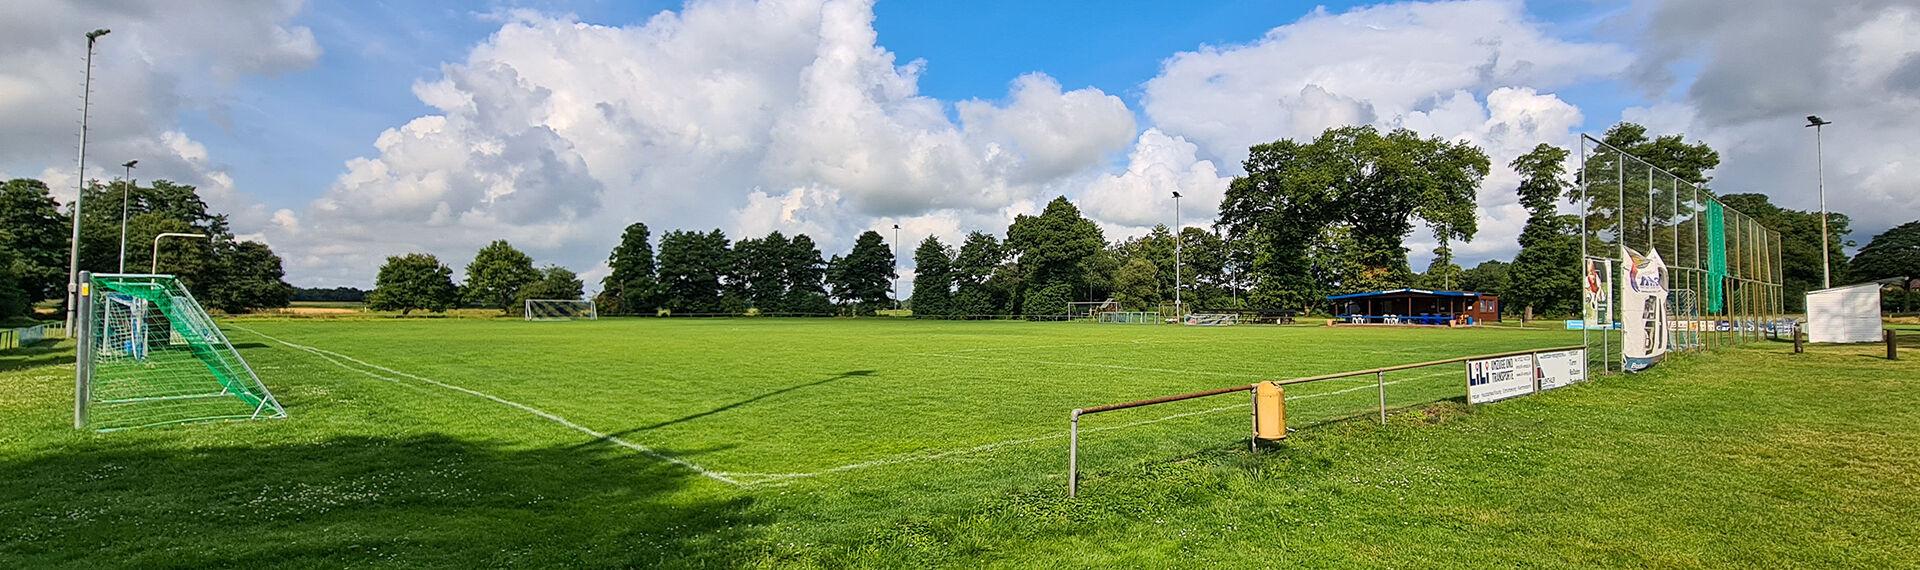 TSV Sportplatz Kleinmoor